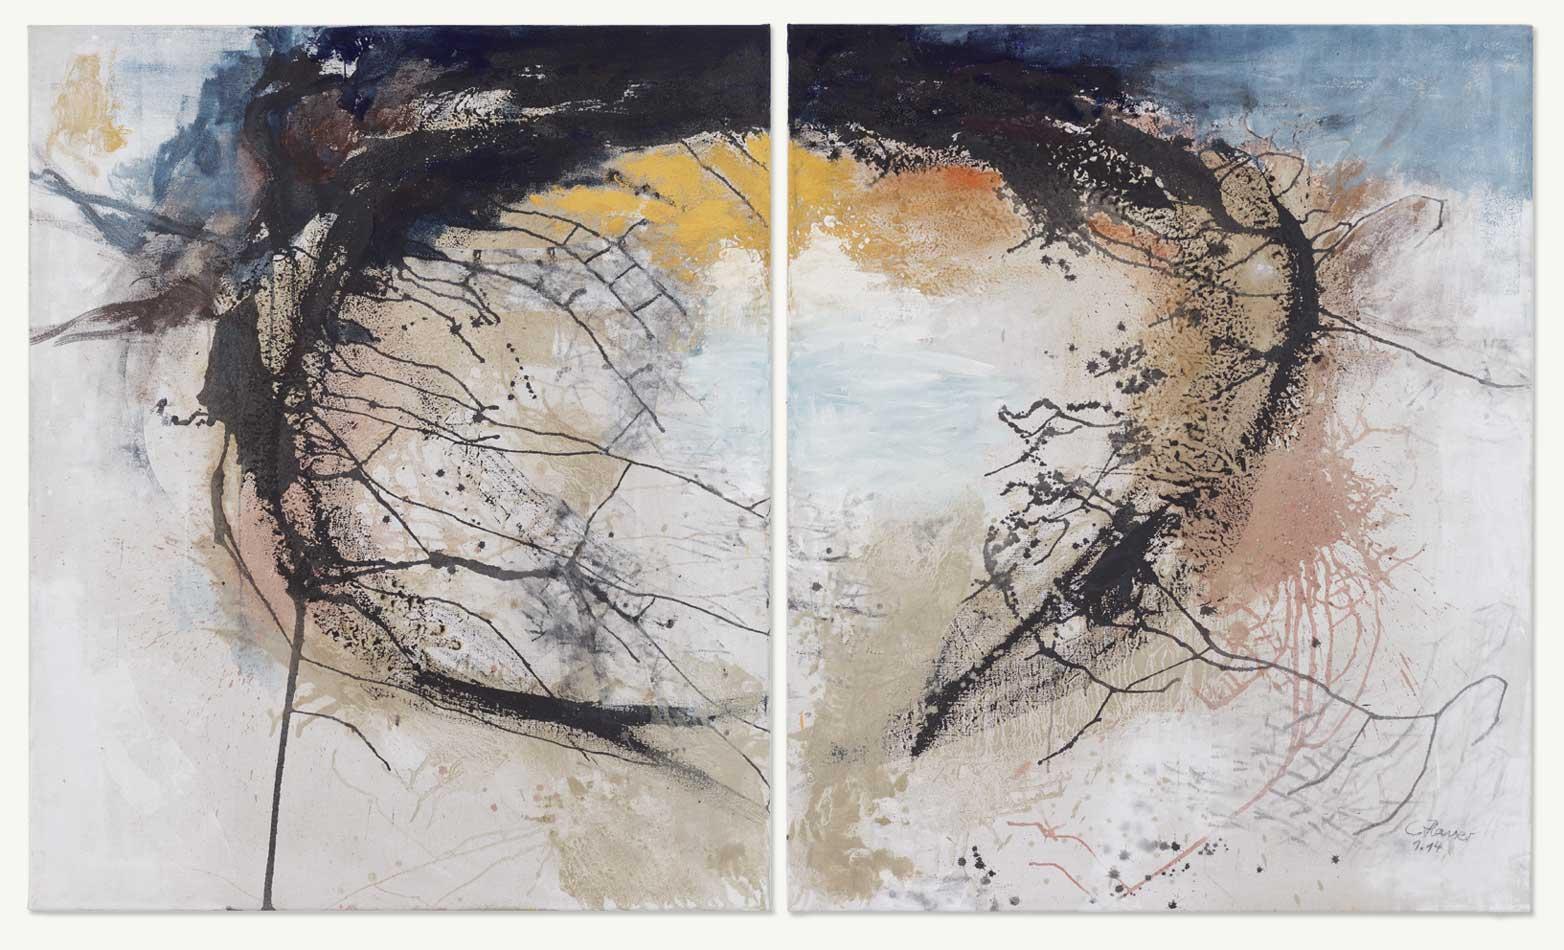 2014, Acryl, Pigmente, Sand auf Leinwand, 2-teilig, 120 x 200